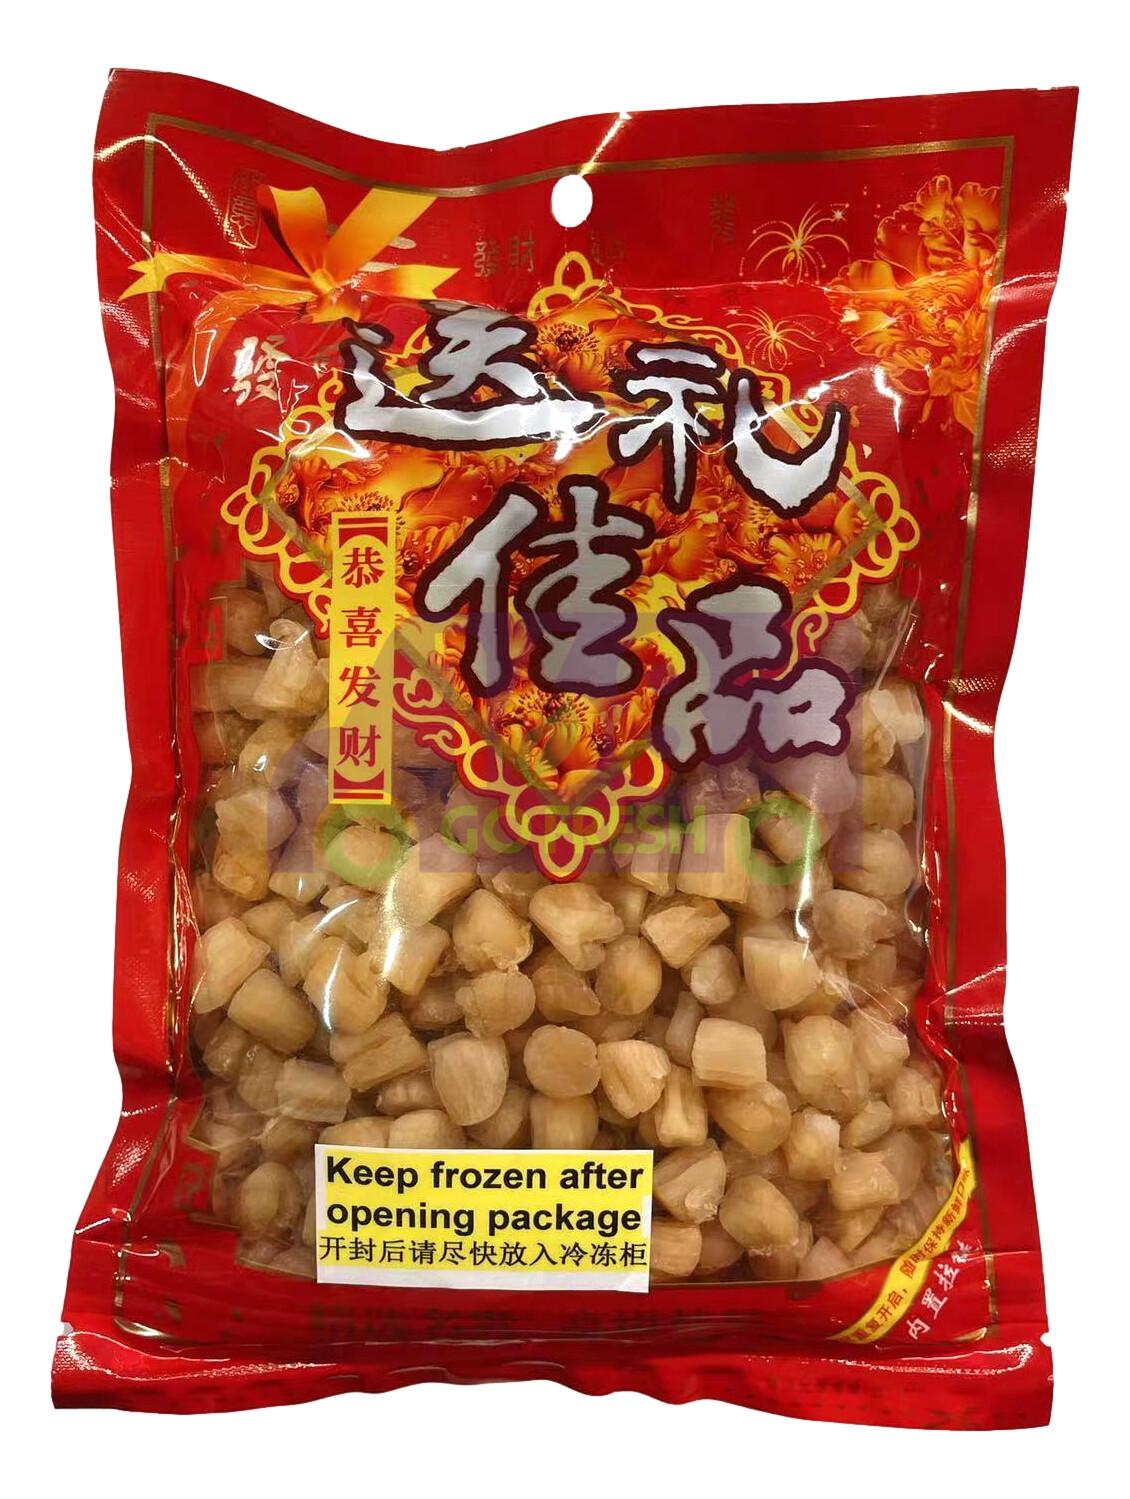 Qingdao G1 Dried Scallops - Small  16oz青岛G1优质干贝/元贝/瑶柱 - 小号1磅装